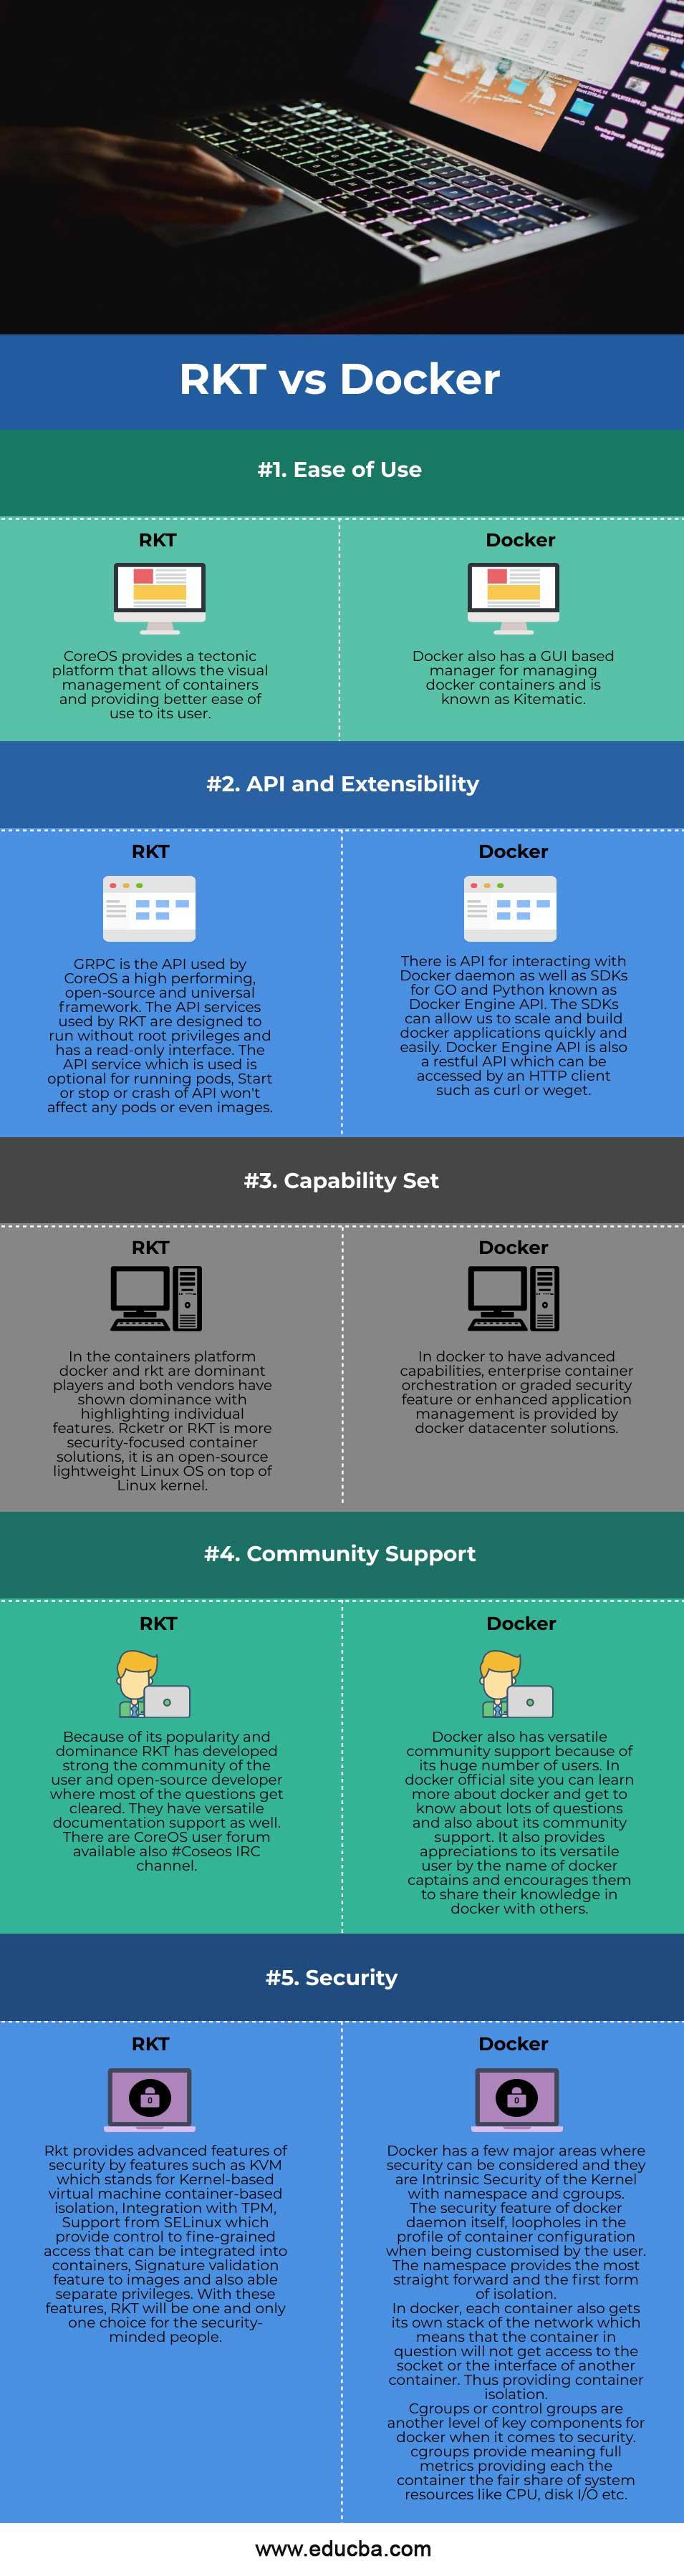 RKT-vs-Docker-info